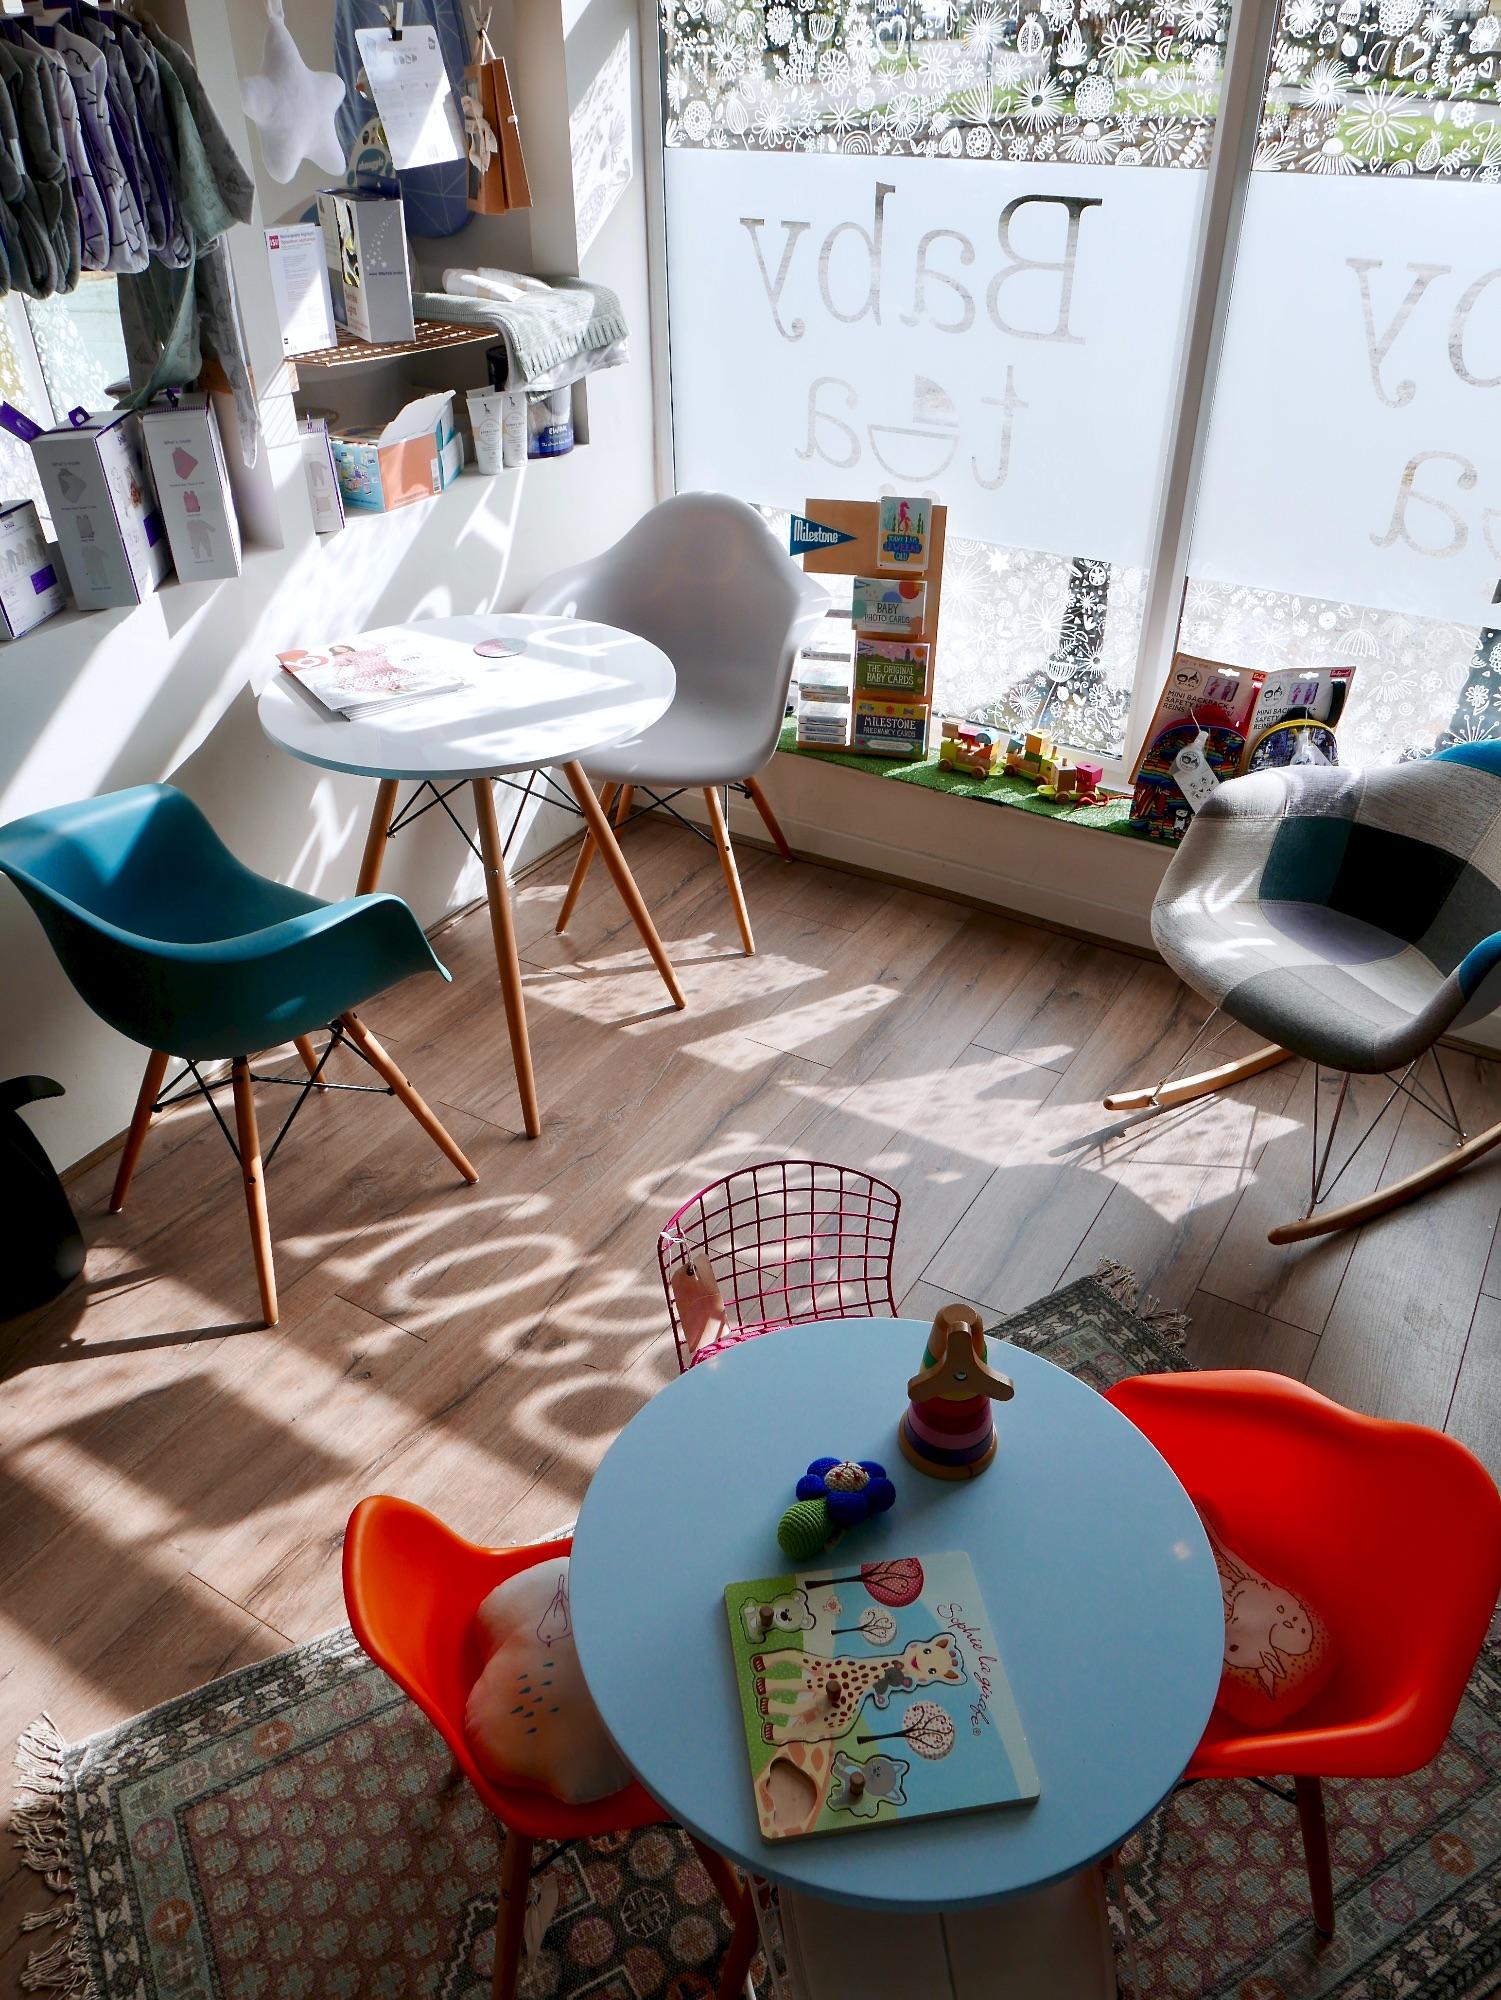 BabyTea: seating area